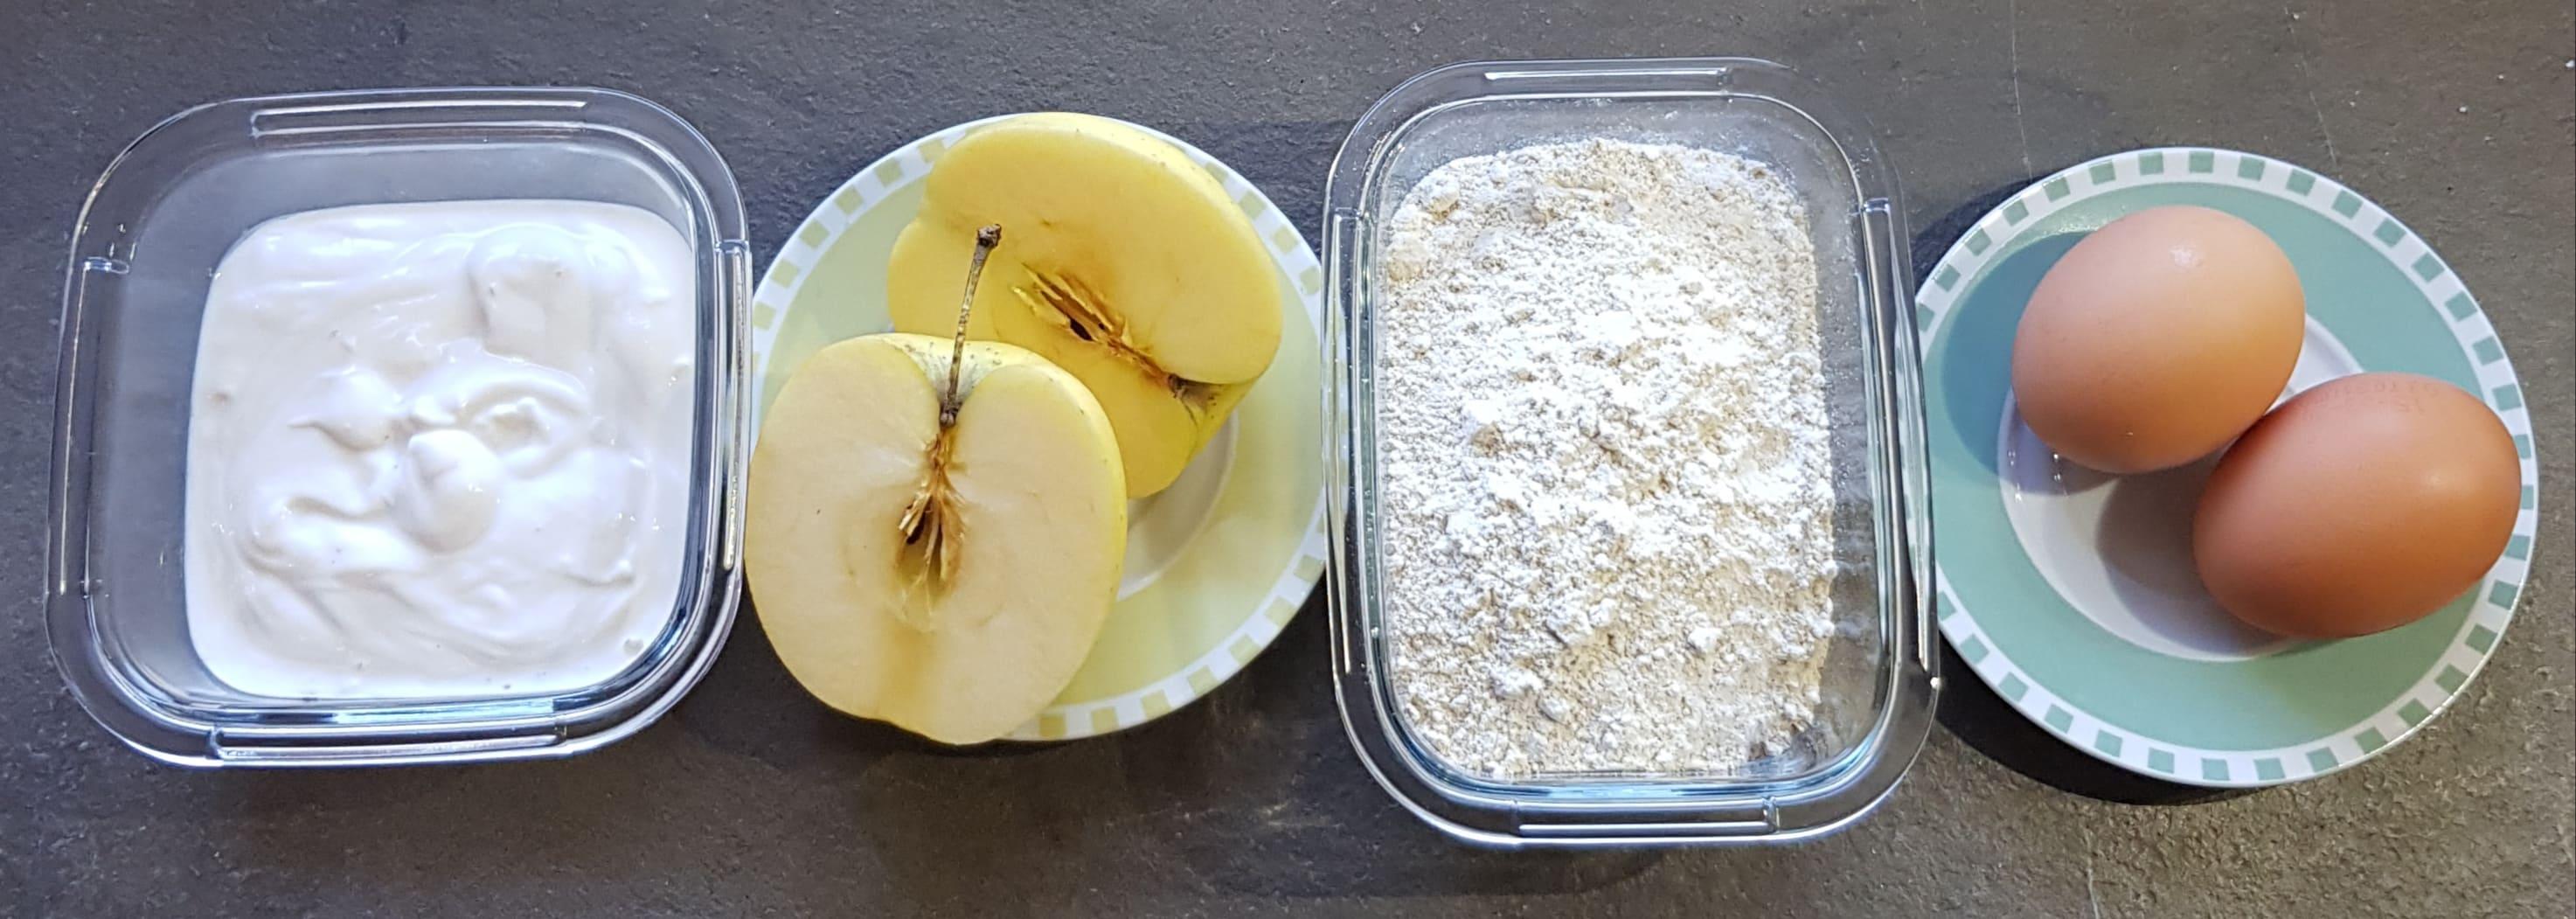 Ingredienti: yogurt bianco, mele, farina, uova